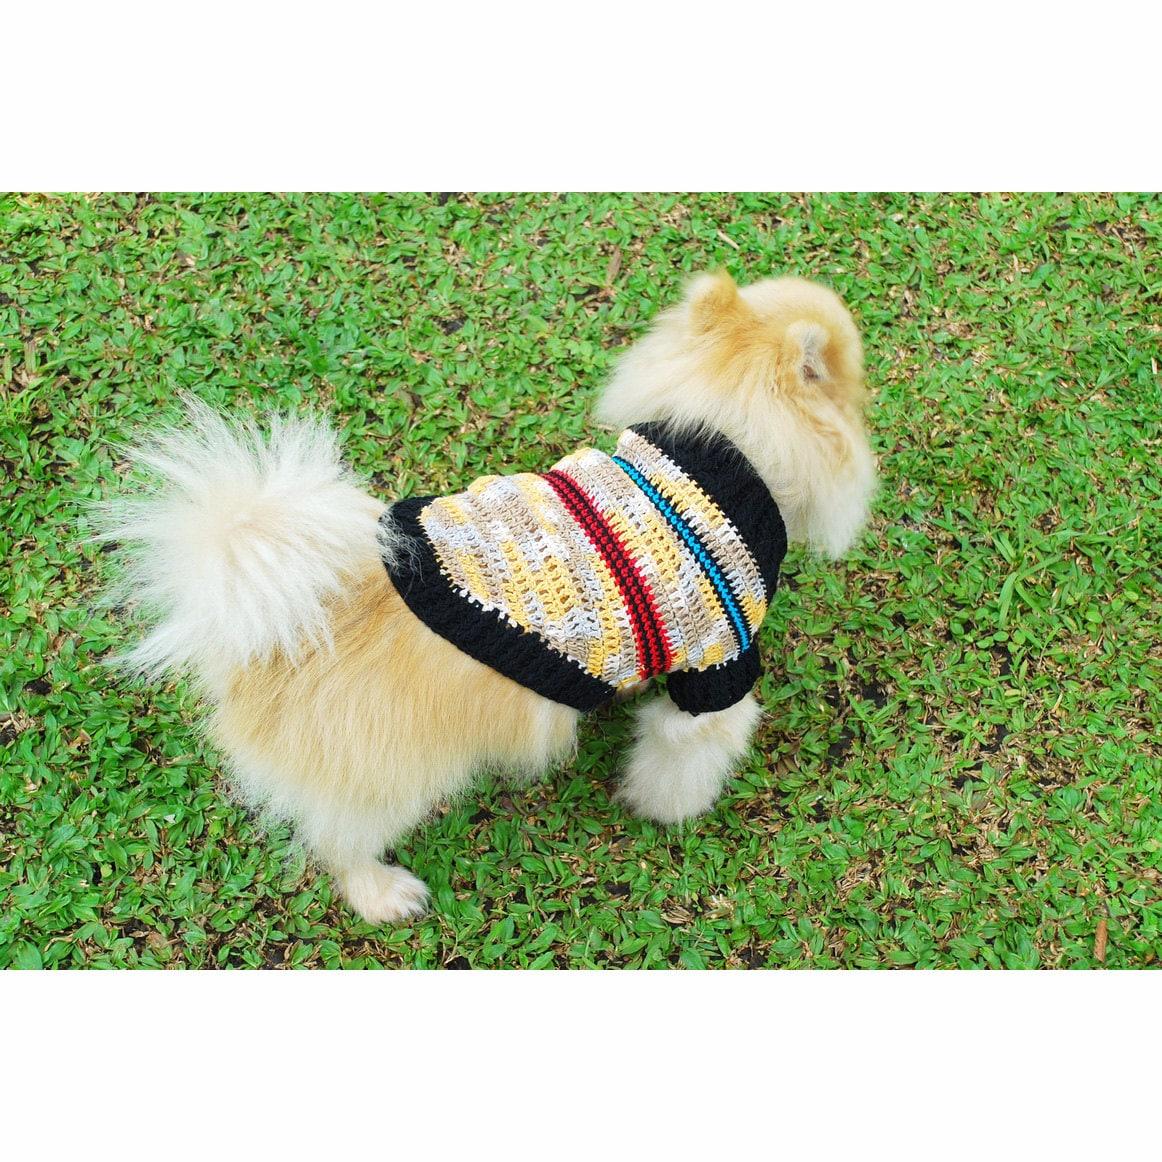 Hund Kleidung Beige rustikale Welpen Pullover Hundepullover